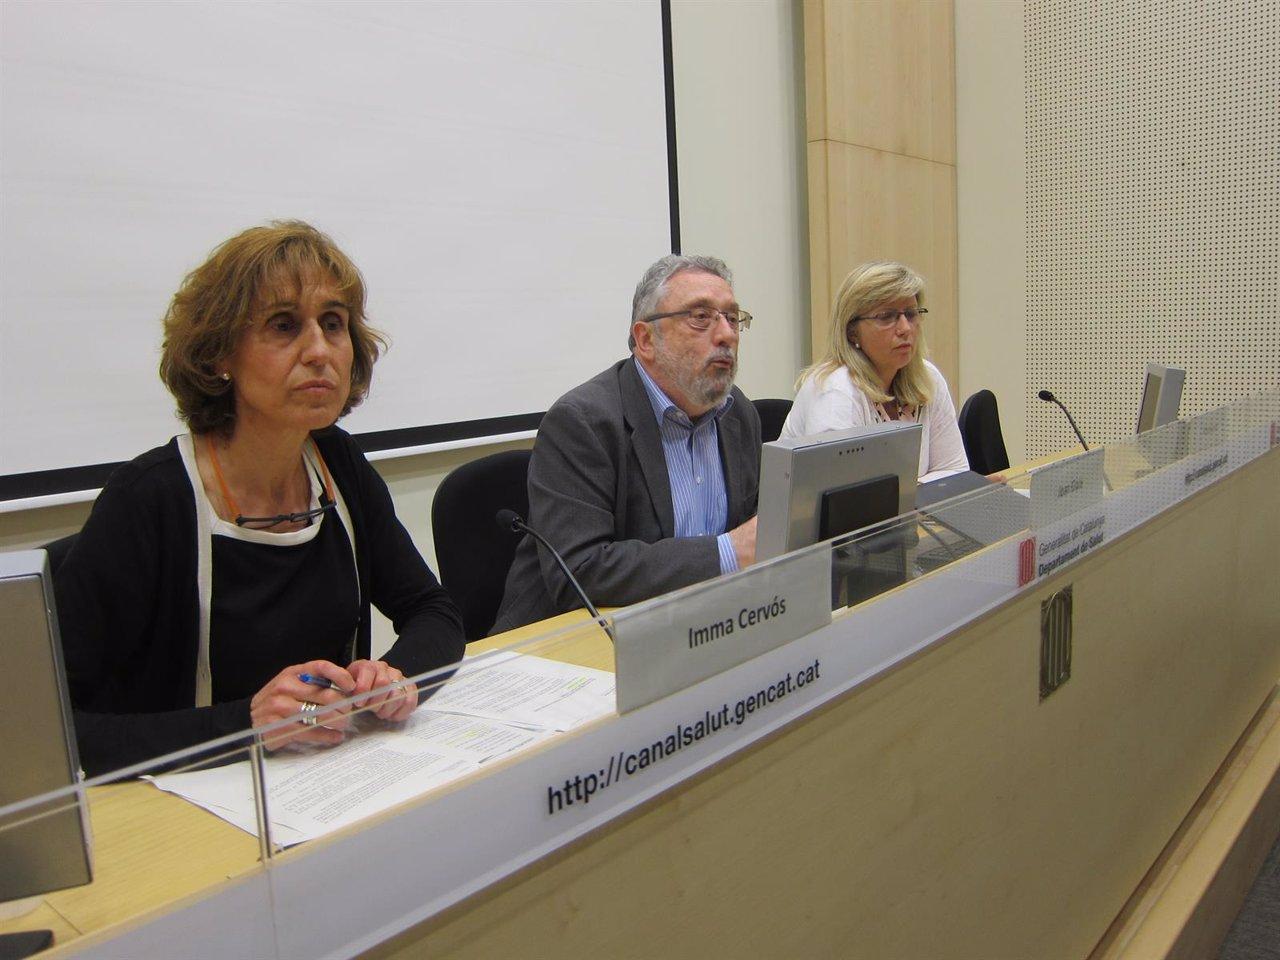 El secretario de Salud Pública, Joan Guix